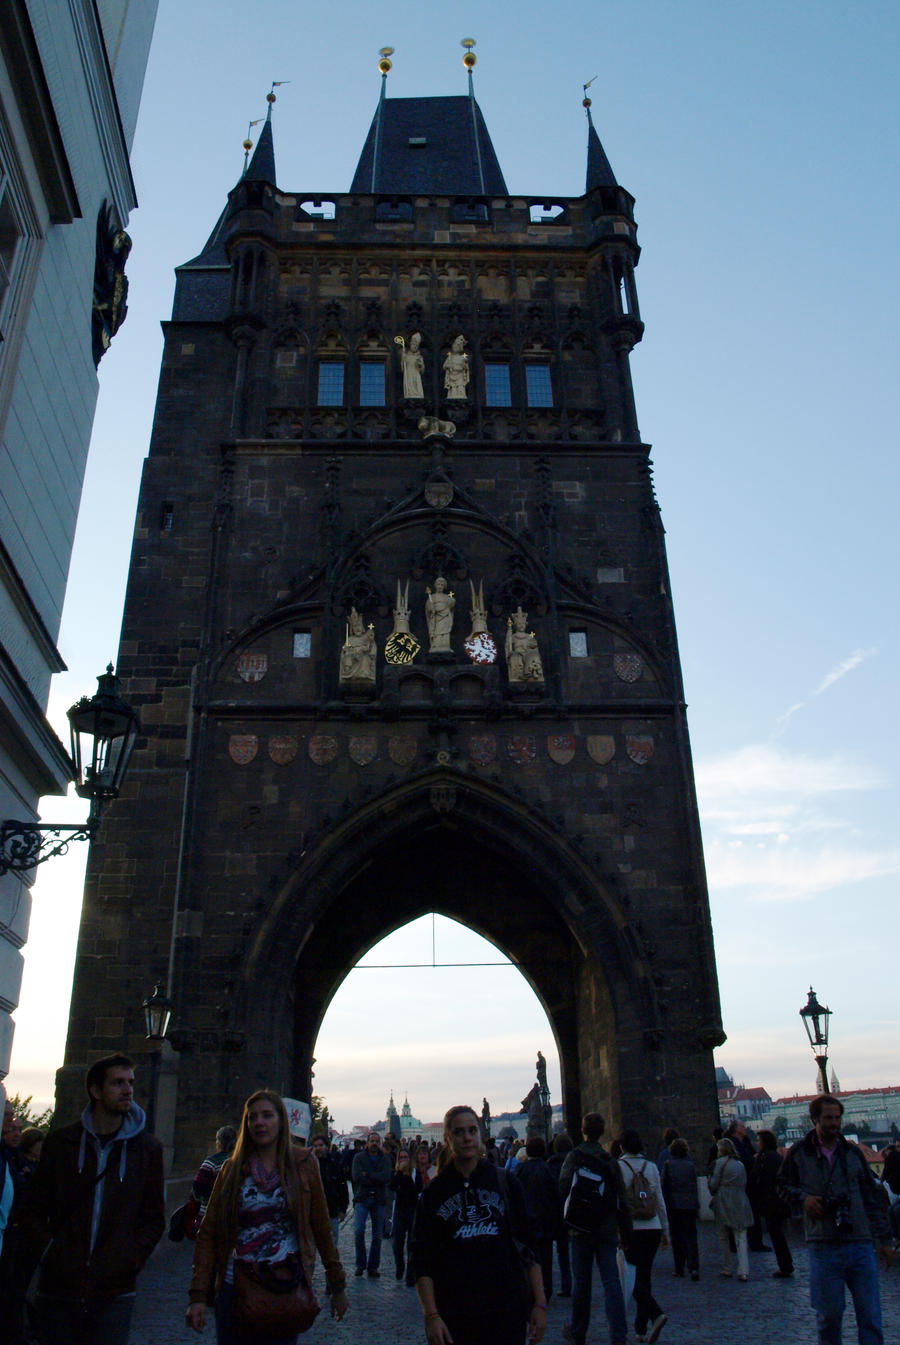 Entrance Tower at Charles Bridge02 by abelamario